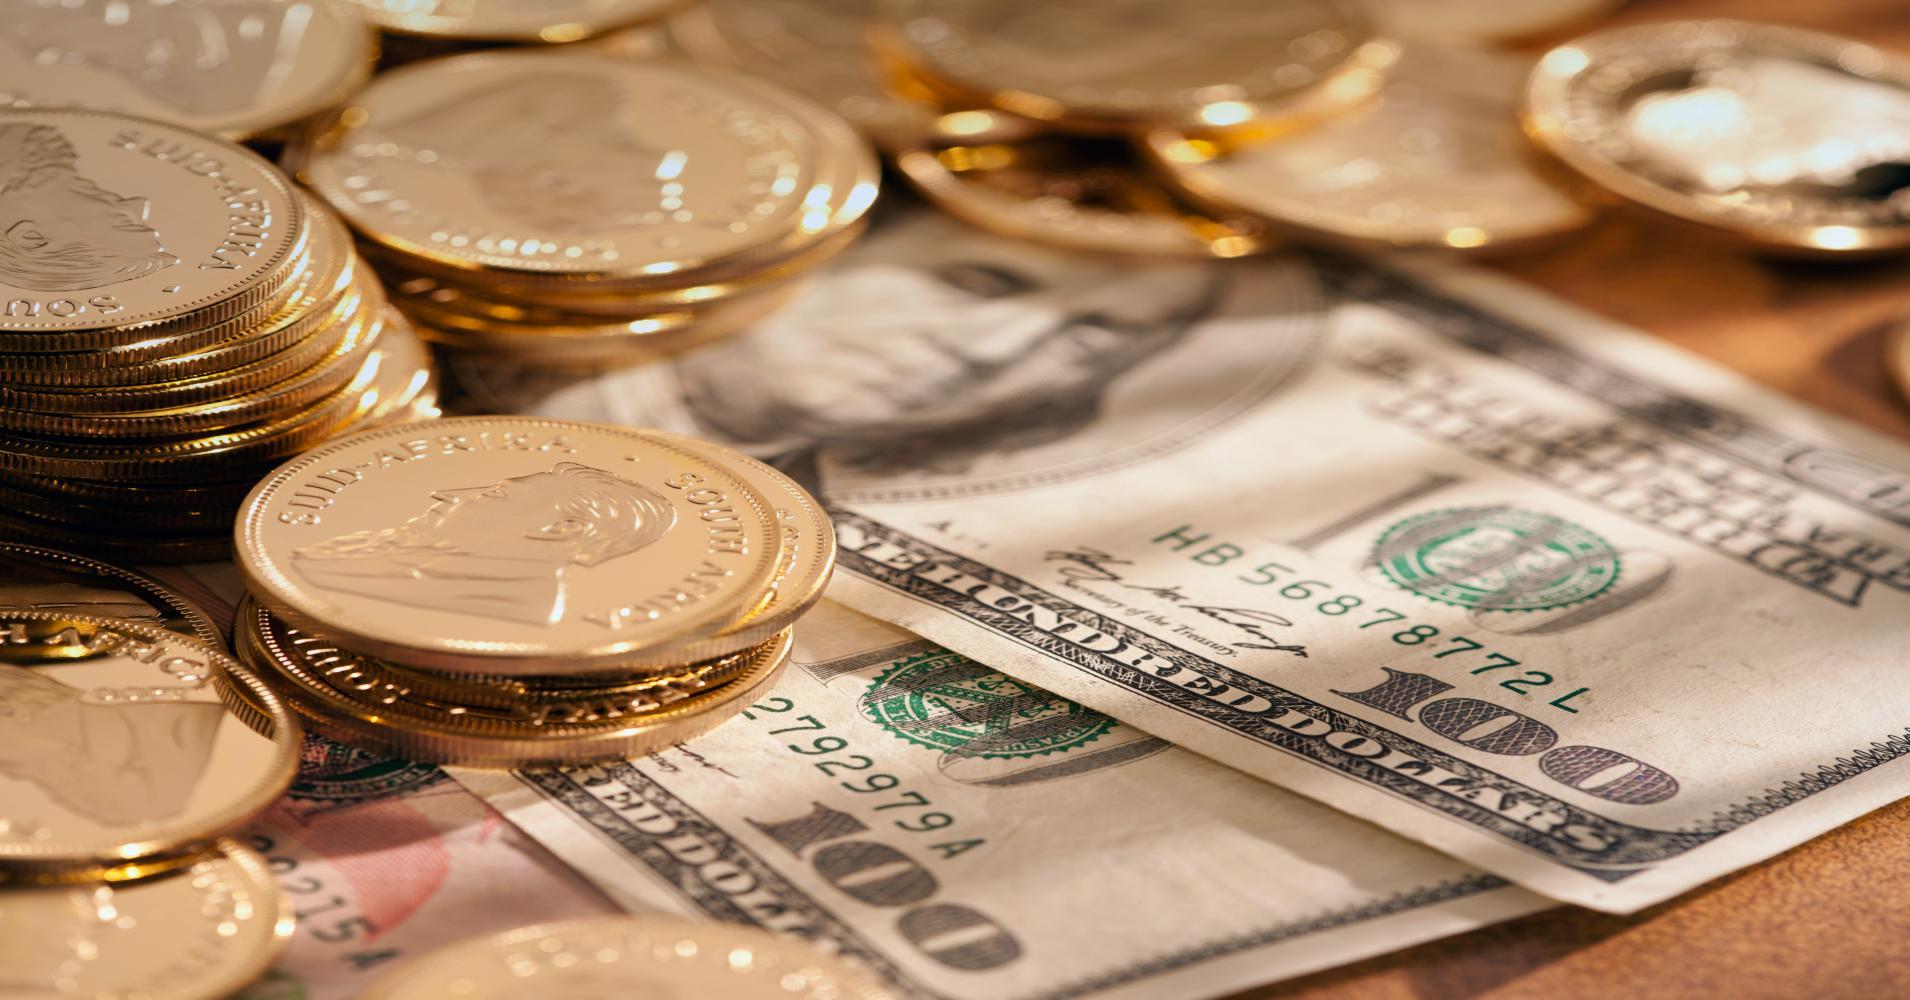 Украина, Экономика, Финансы, Курс валют, Доллар, Гривна.